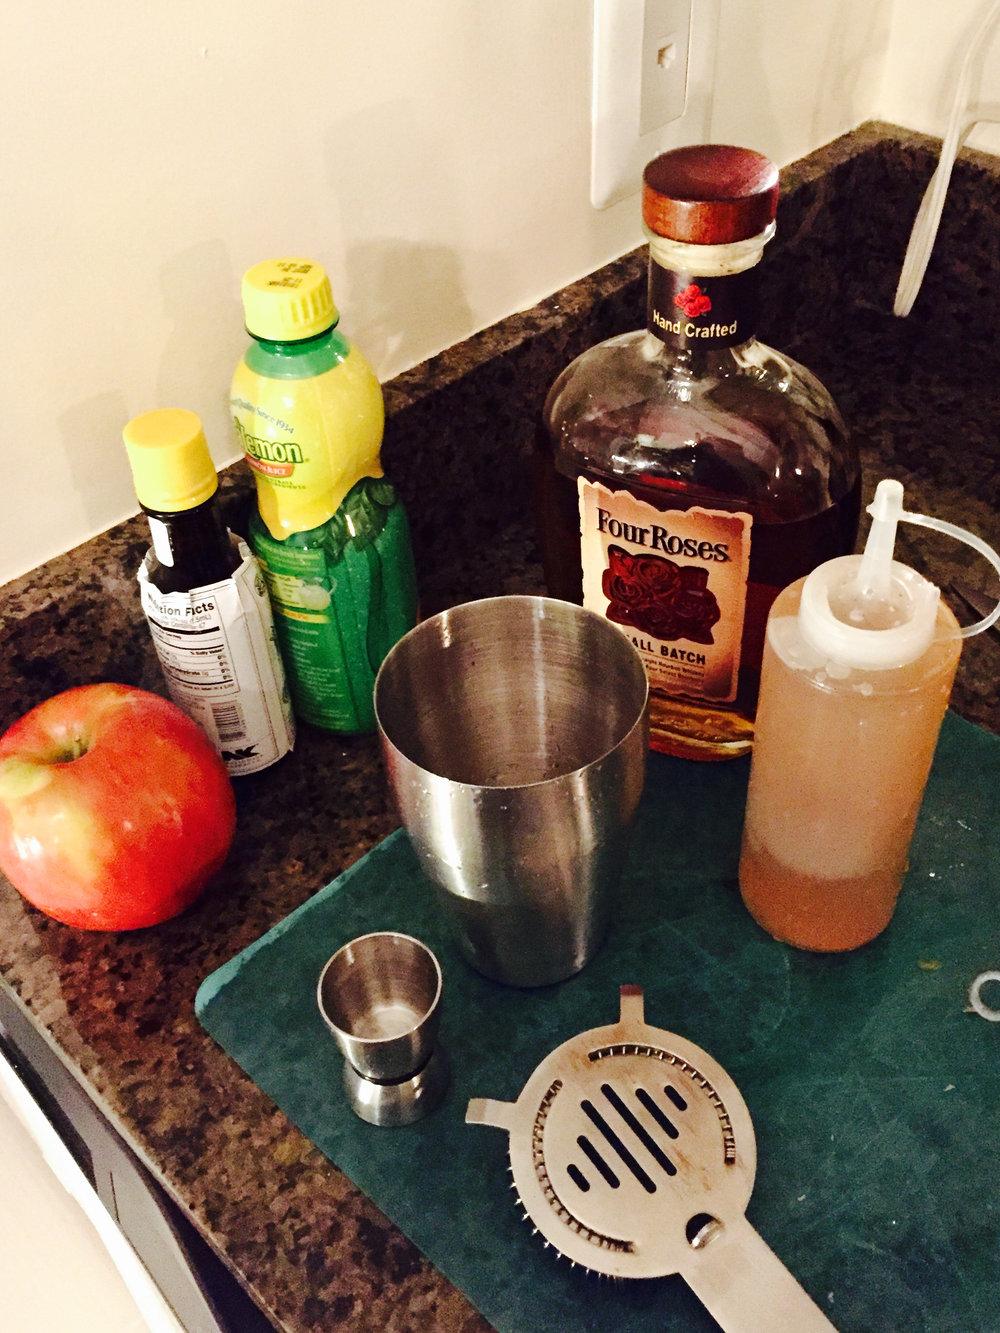 The Apple Claus setup!